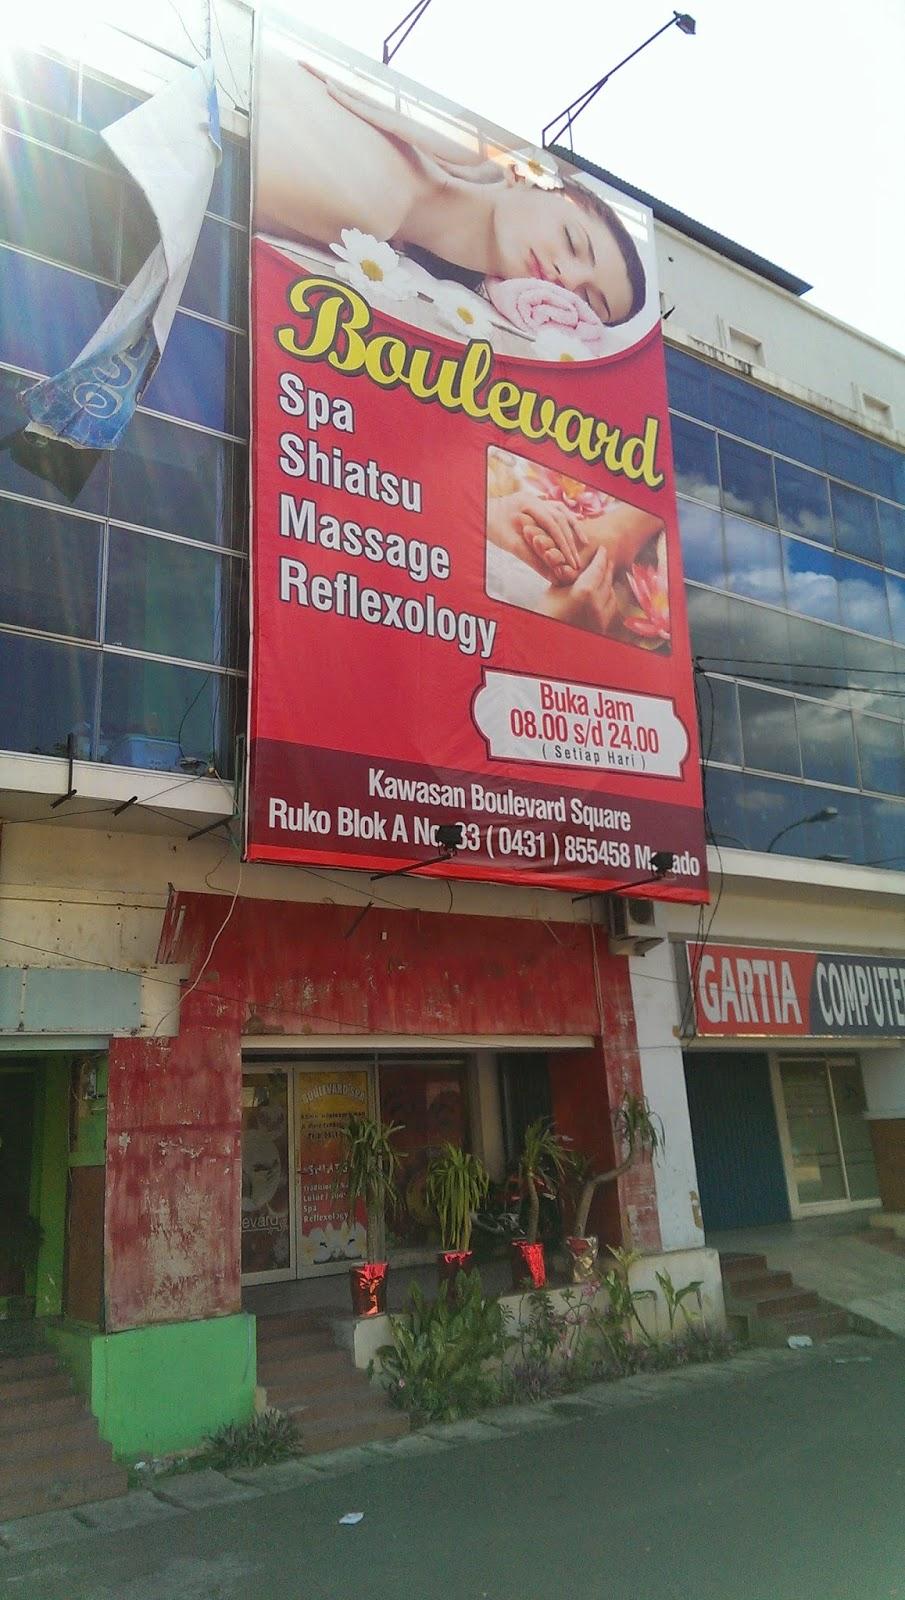 Boulevard Spa Manado Front Quality Hotel Massage Parlour 200 000